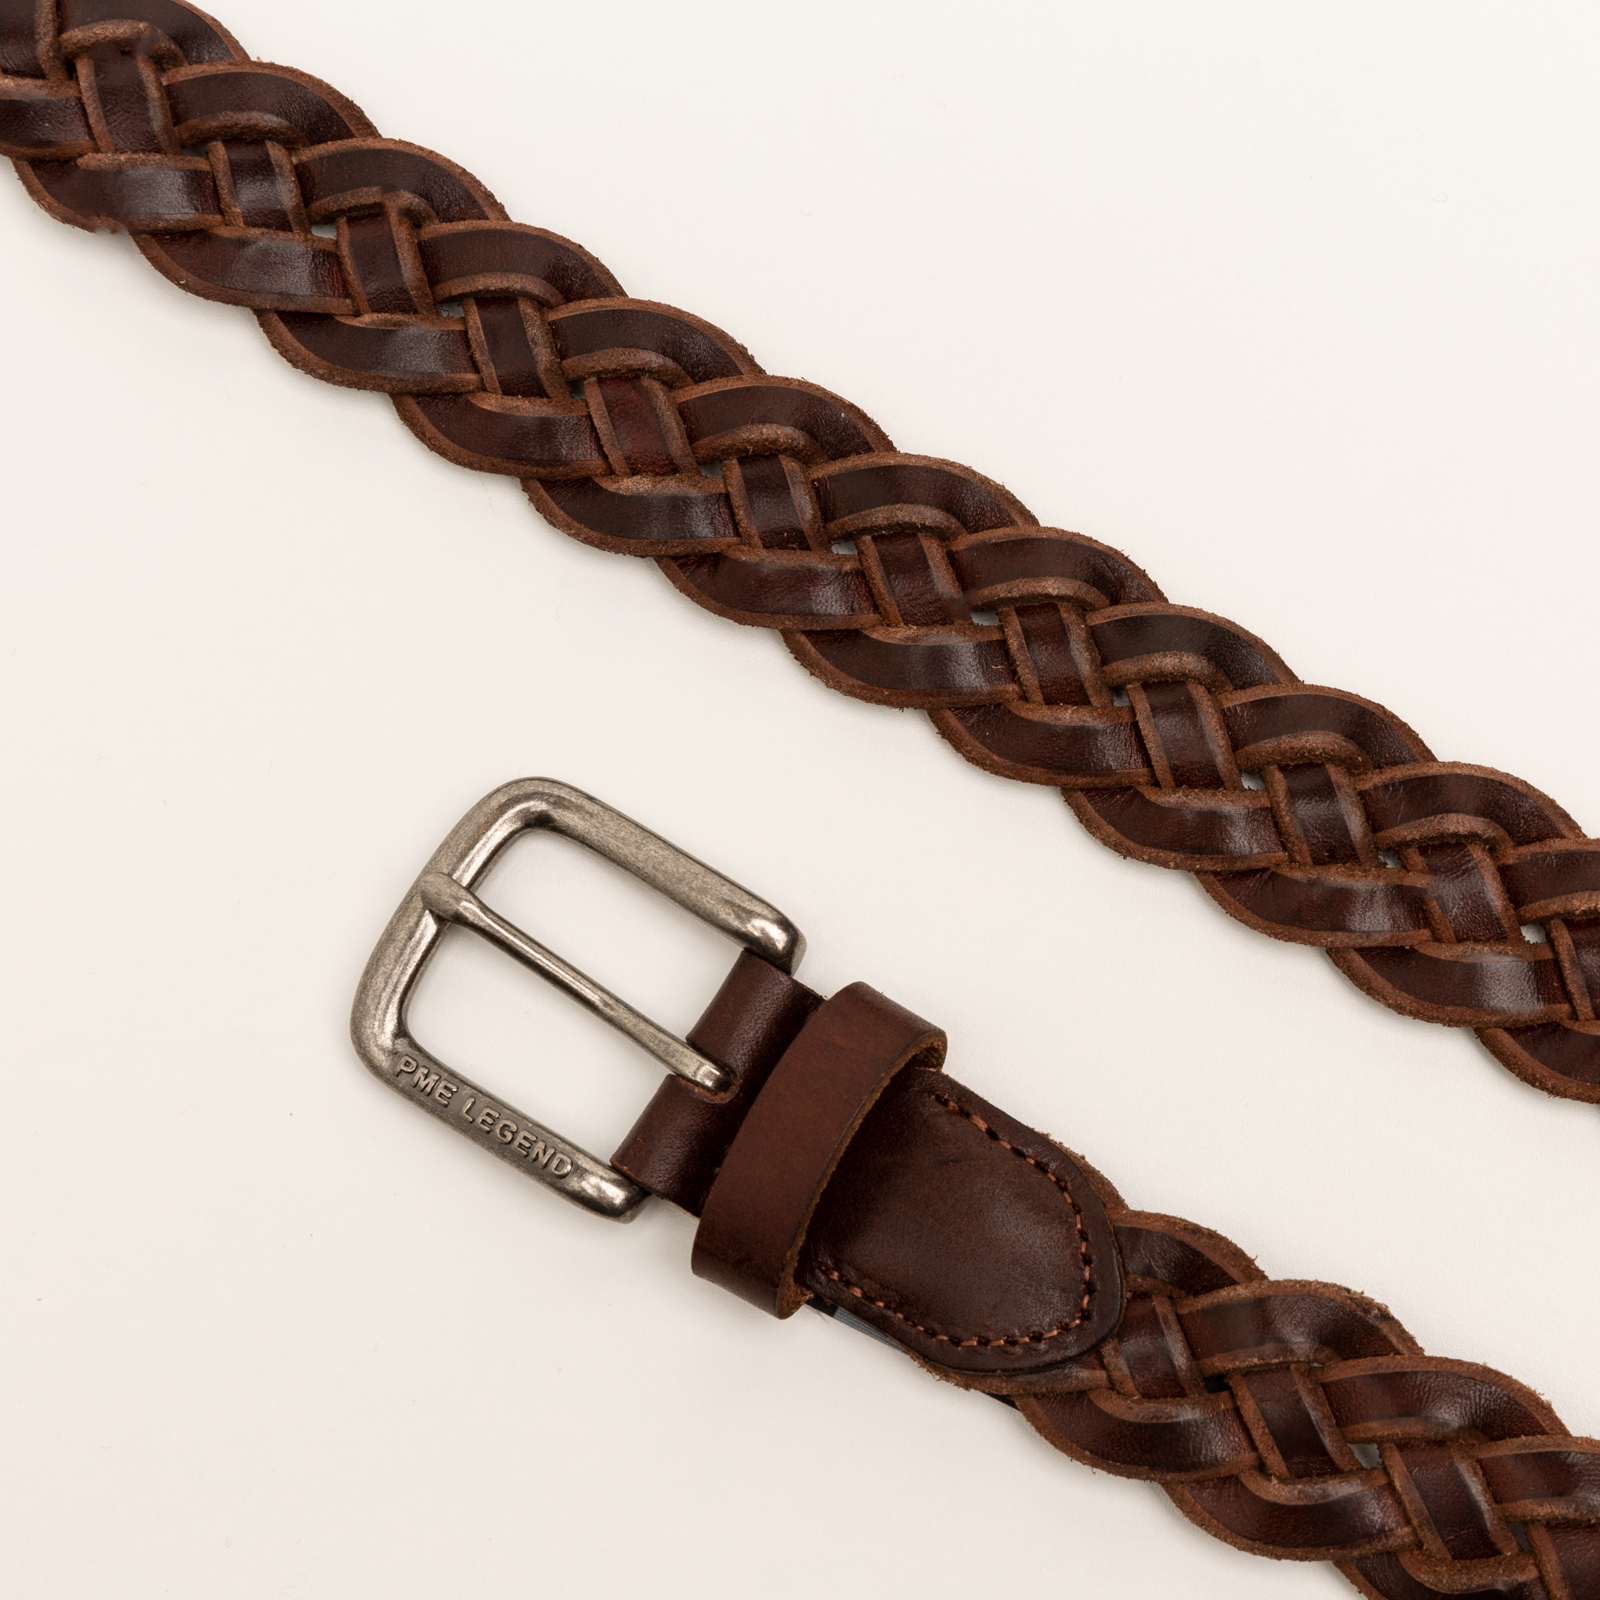 PME Legend PBE211203 771 PME Legend Belt Italian leather braided belt Brown